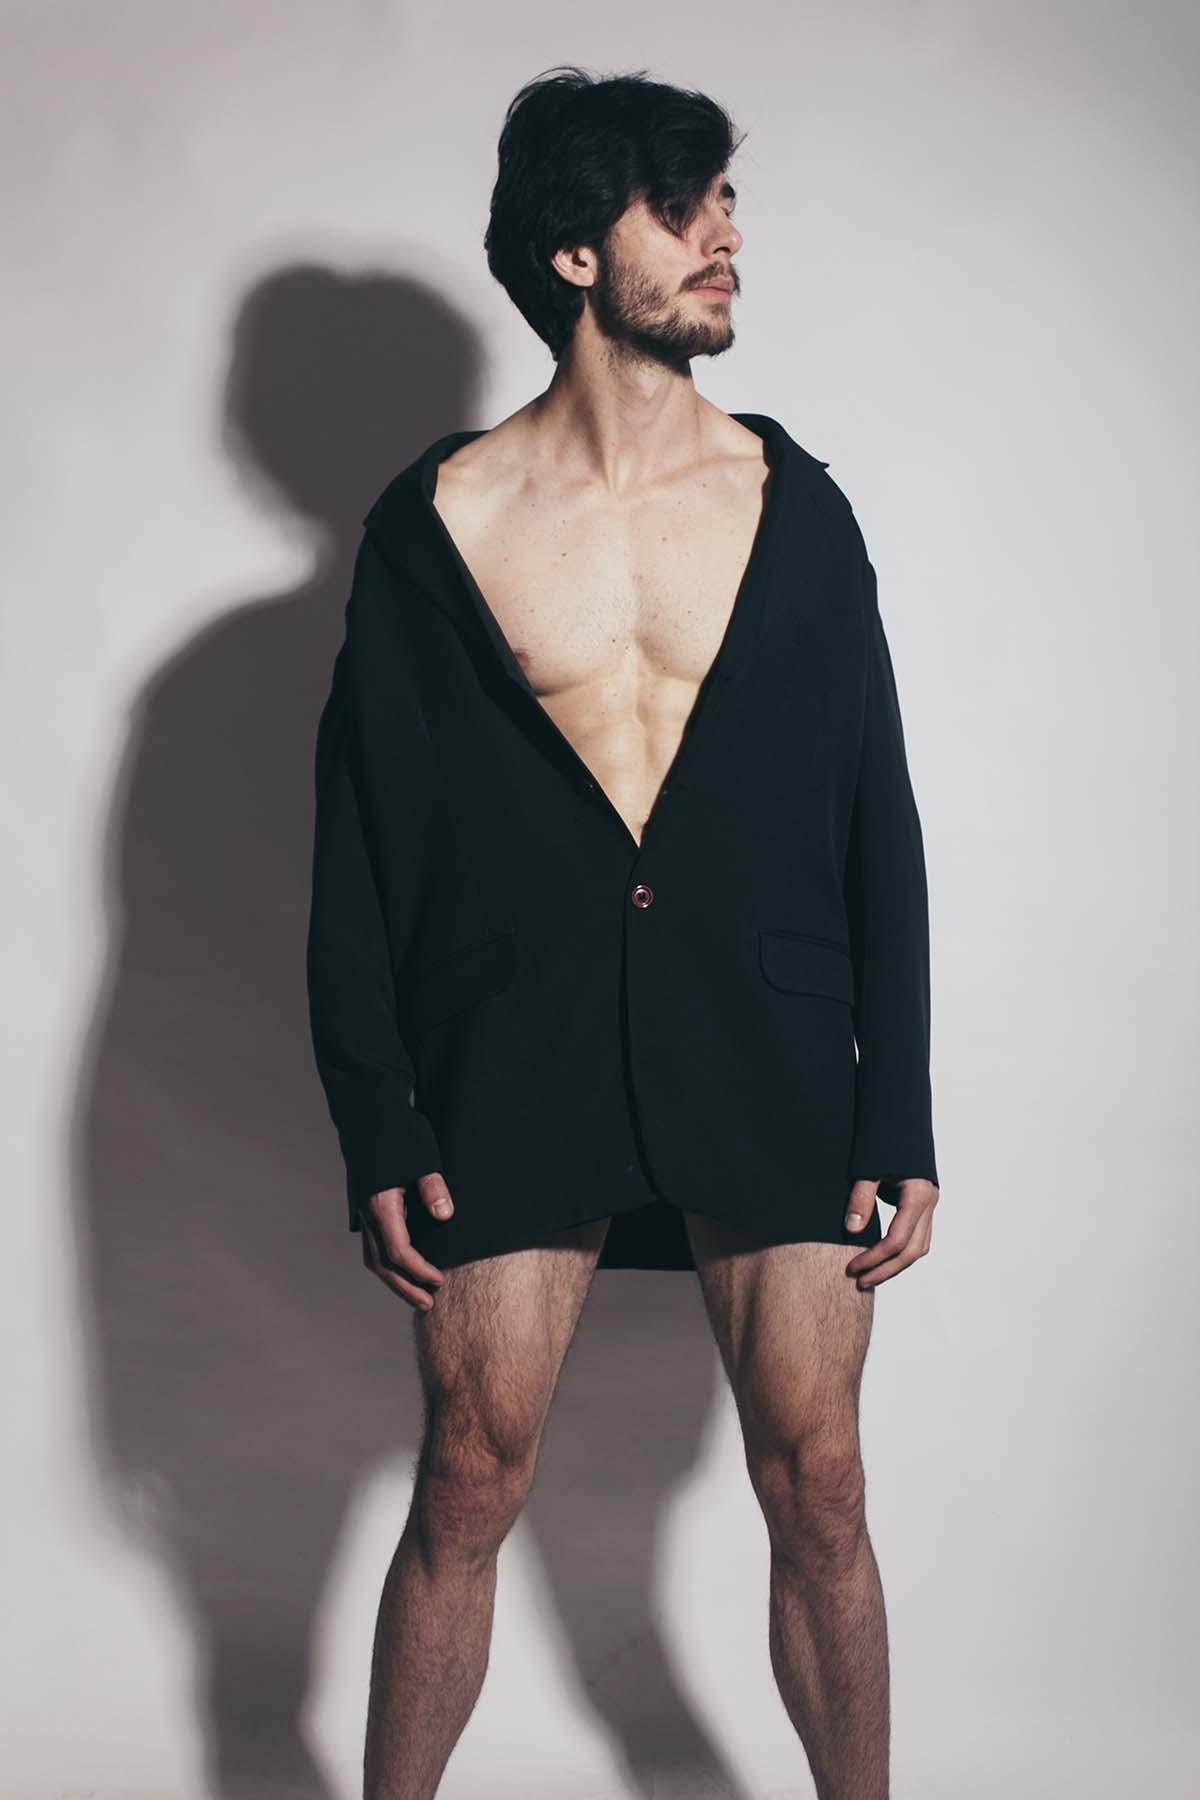 Jeferson Arendacz by Vinicius Costa for Brazilian Male Model